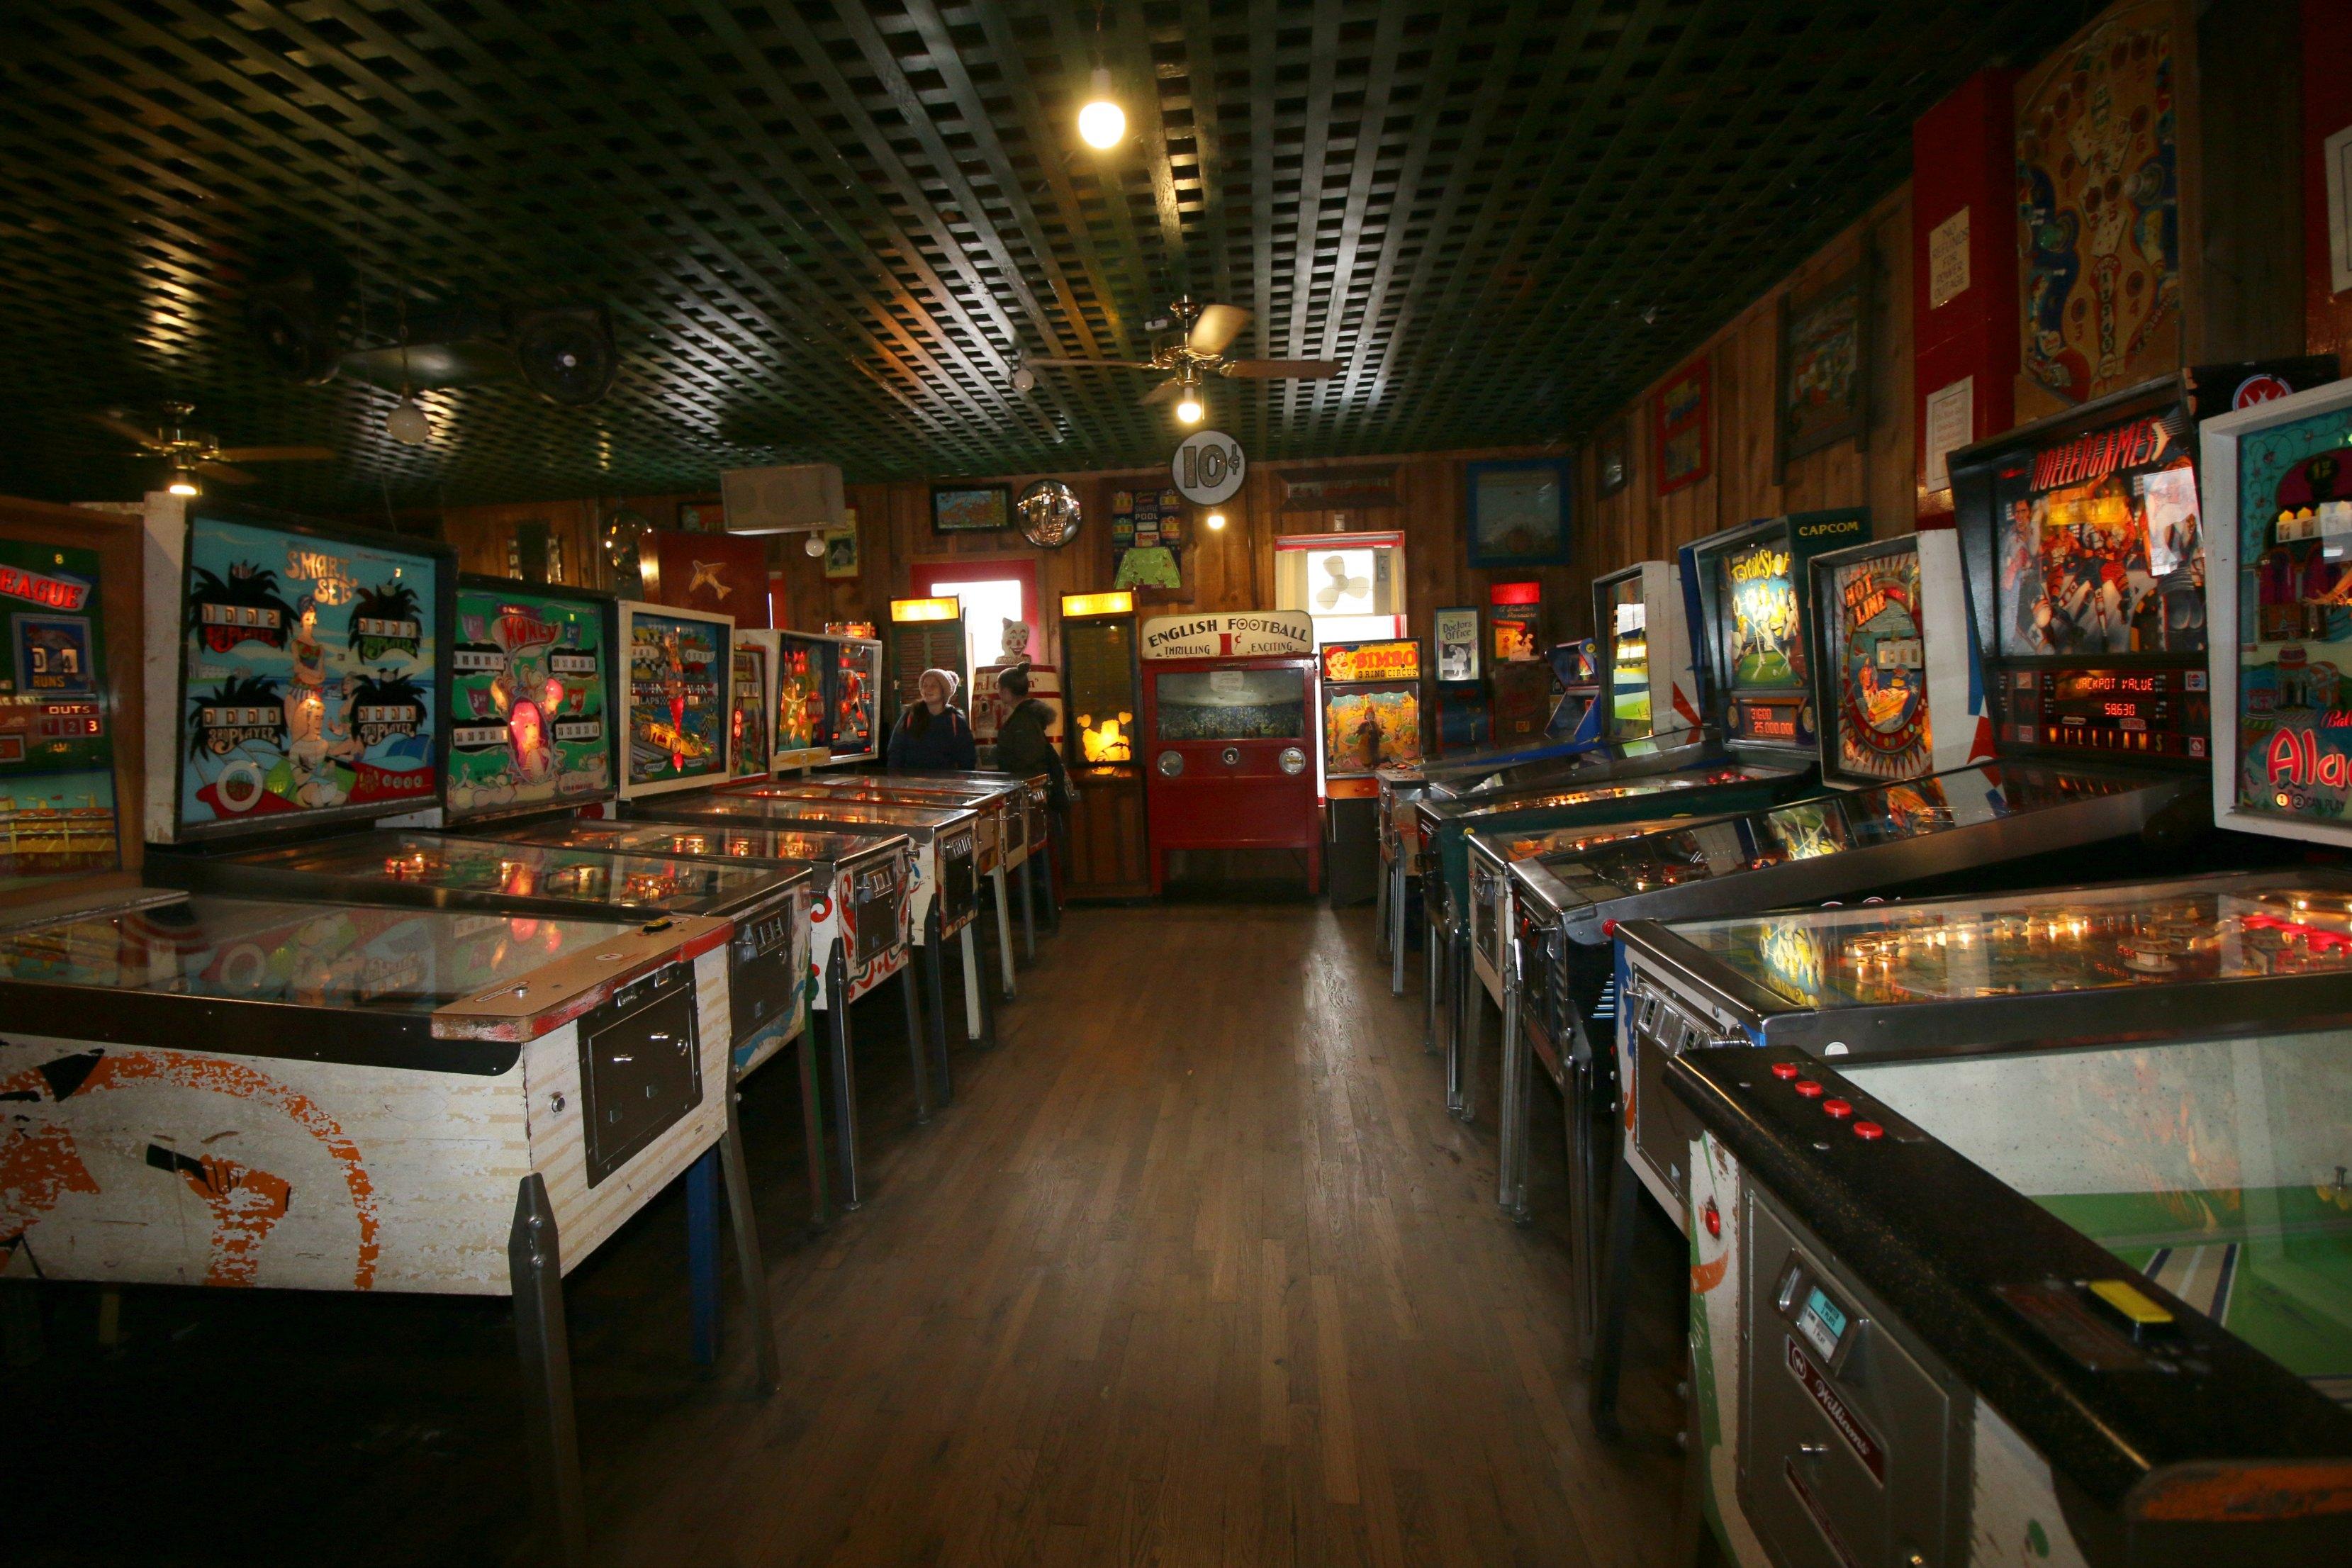 manitou-springs-family-arcade